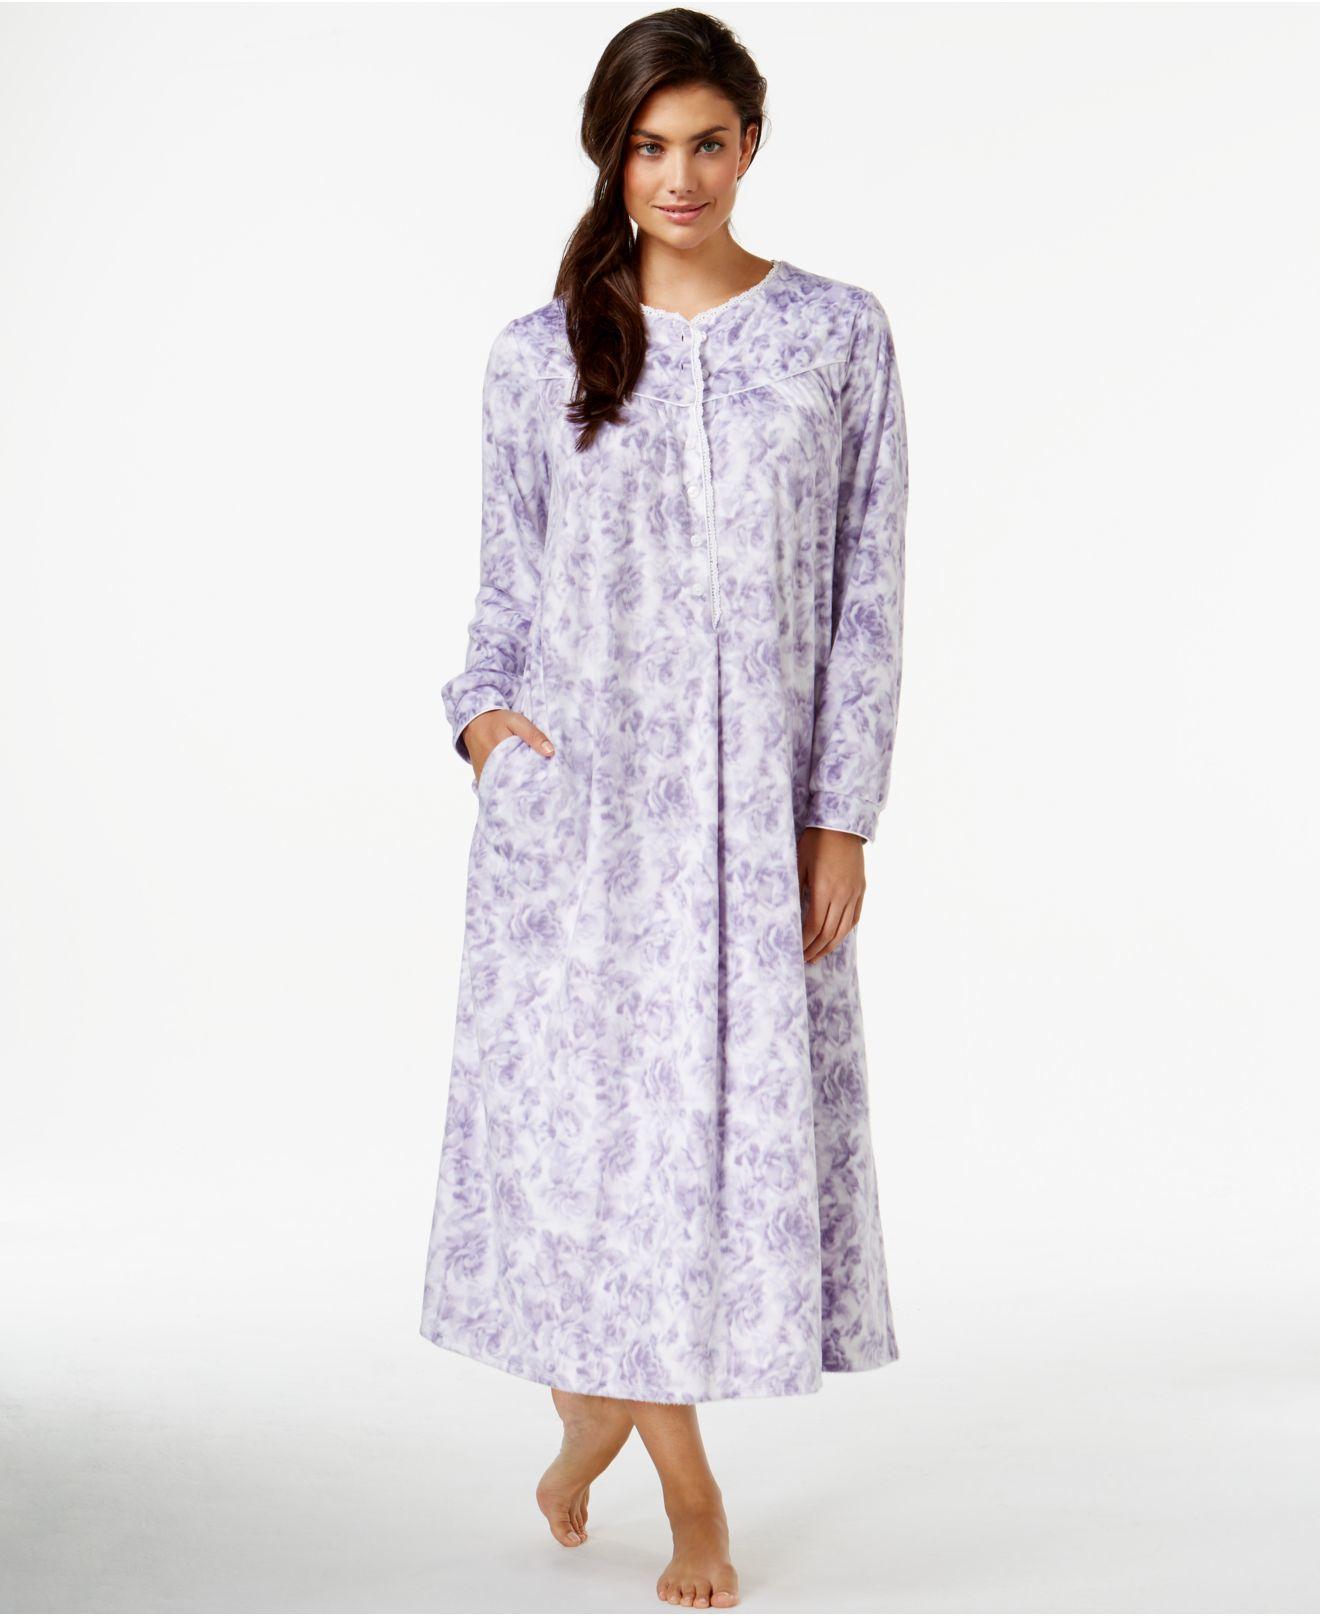 Lyst - Lanz Of Salzburg Long Flannel Nightgown in Purple